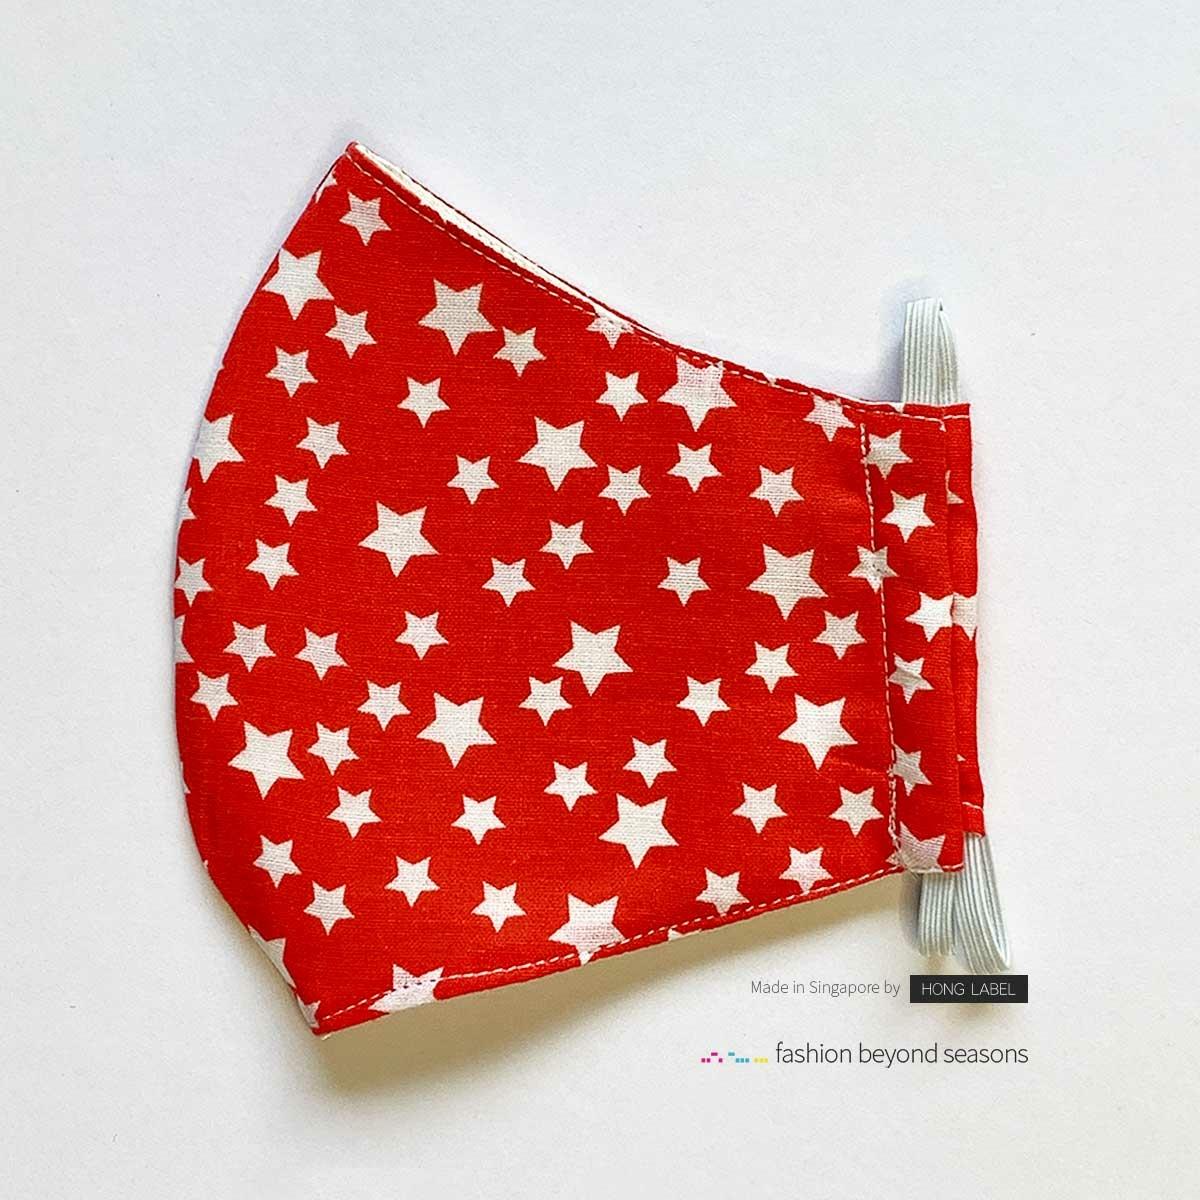 Three layered satin cloth mask with filter insert - blue stars design